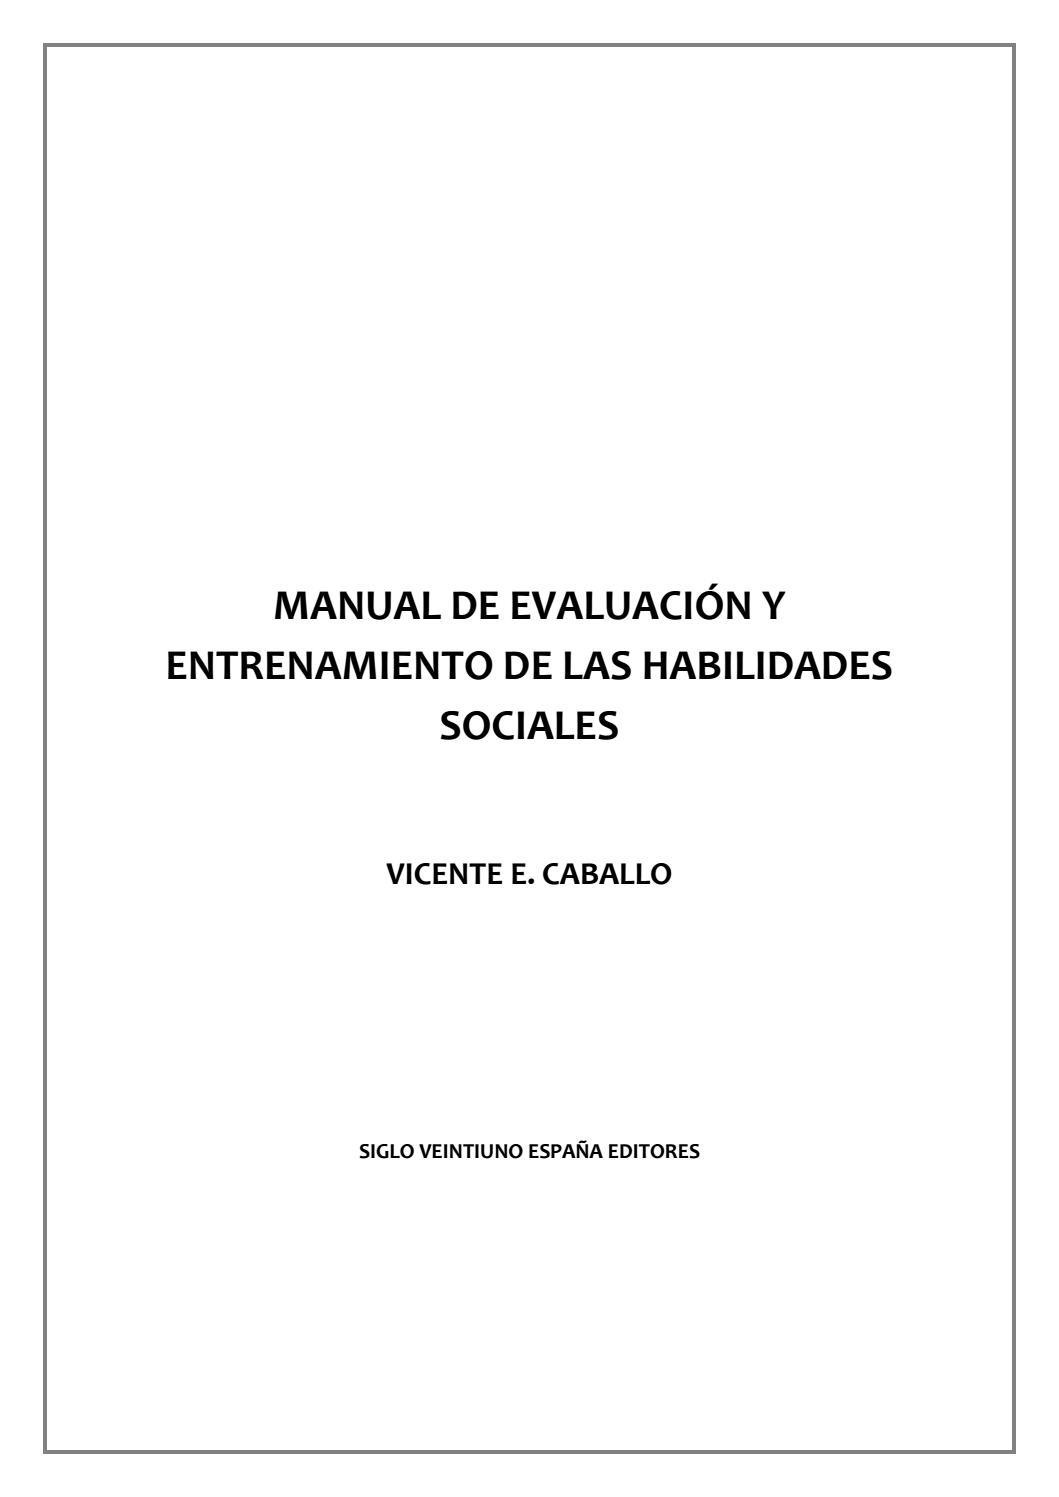 240975528 caballo manual de eval y entrenamiento en hhss caballo by ...